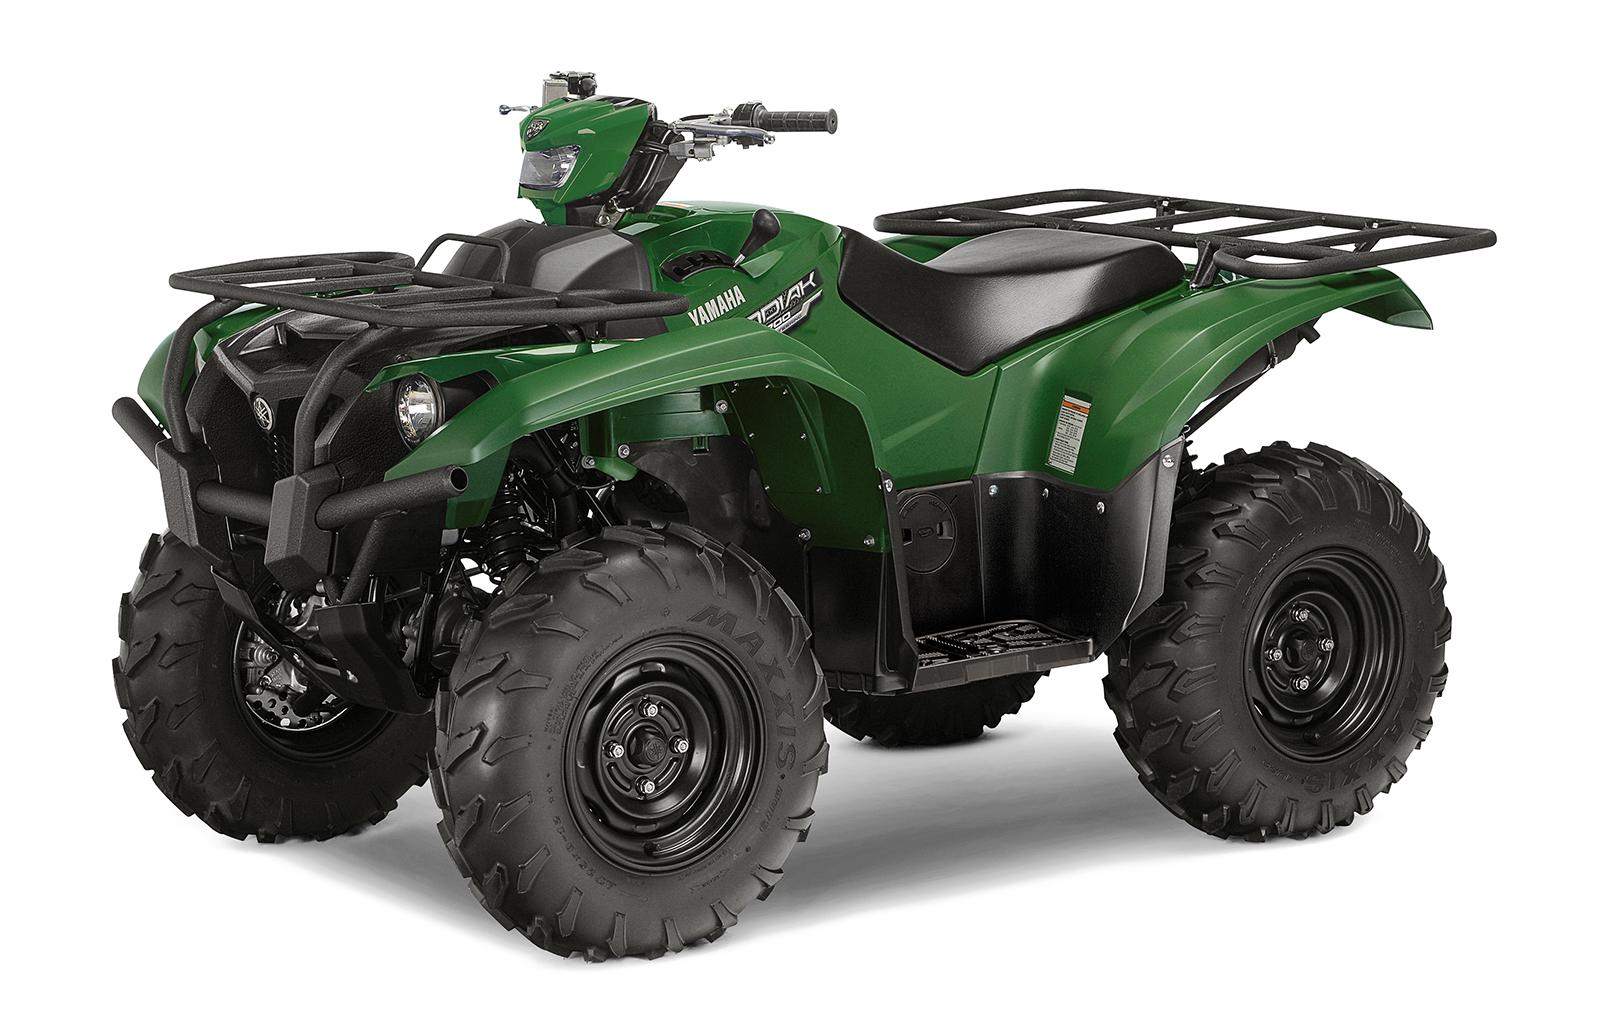 16od Kodiak Eps Green S4 Rgb Lores All New 2016